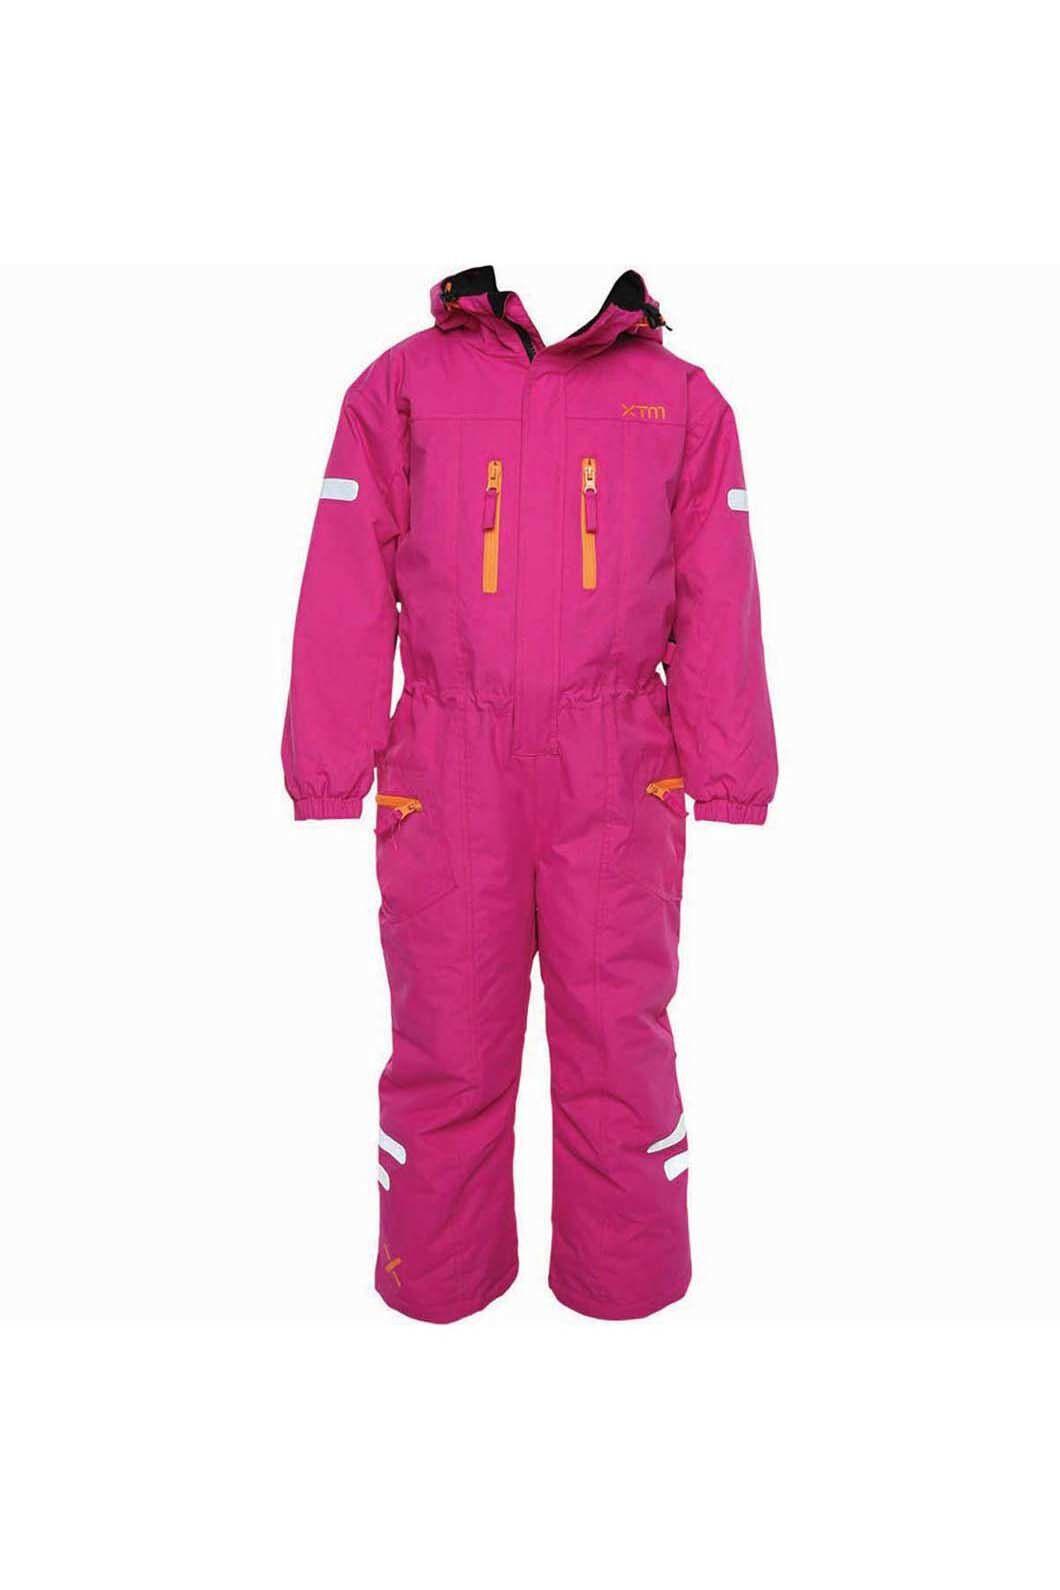 XTM Kids' Kori Suit Bright, BERRY PINK, hi-res